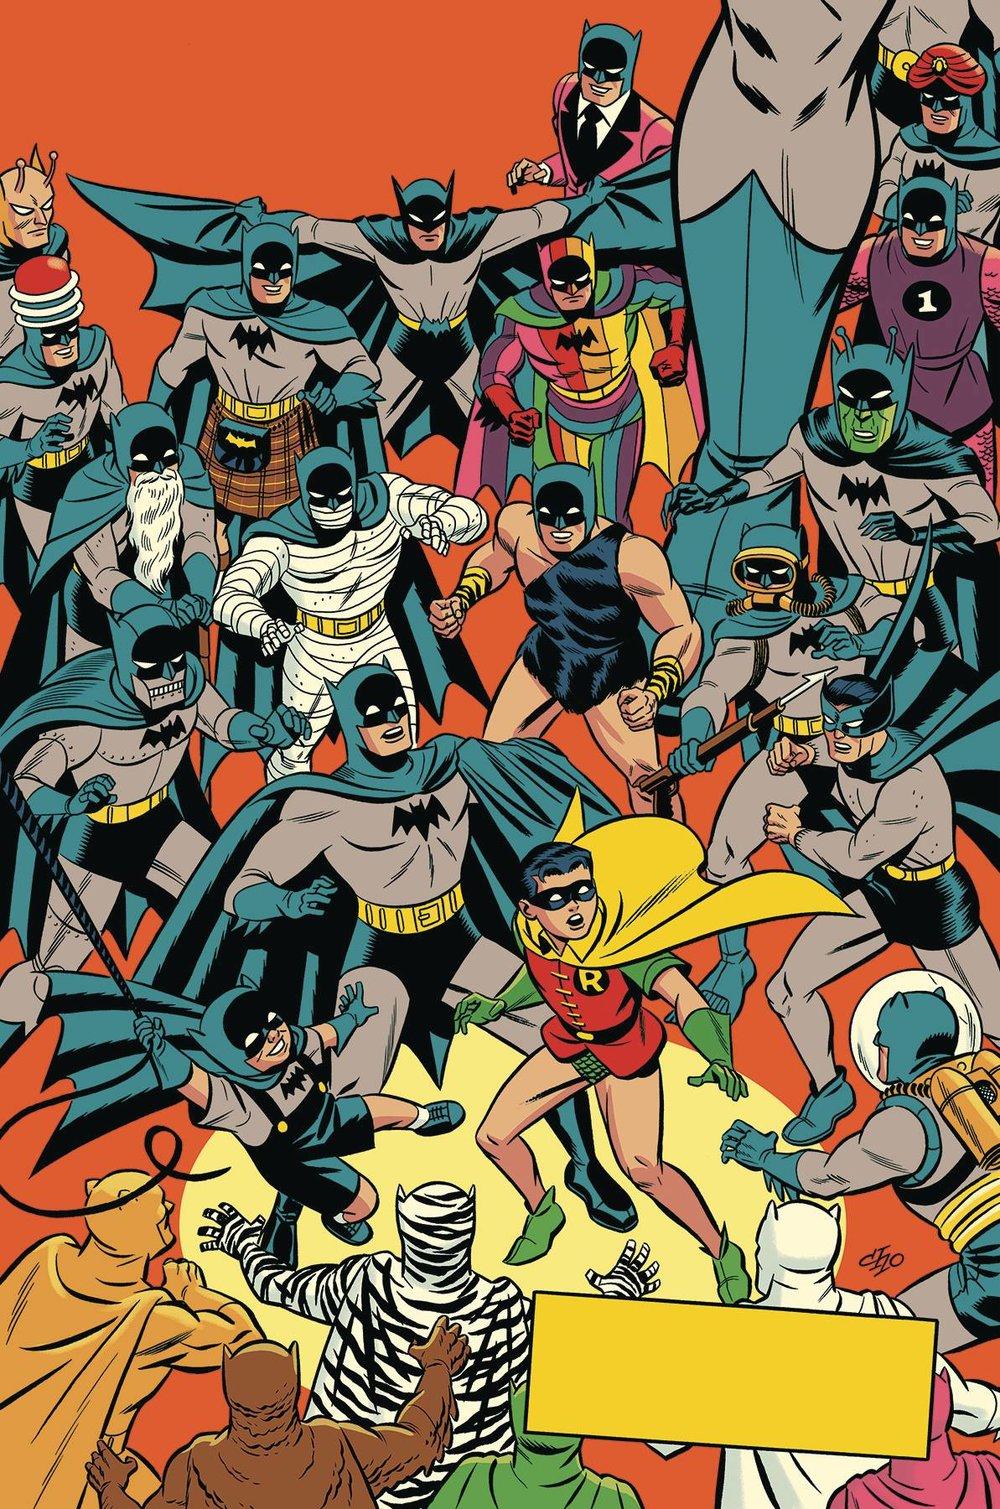 D. Detective Comics #1000 1950s Variant by Michael Cho -